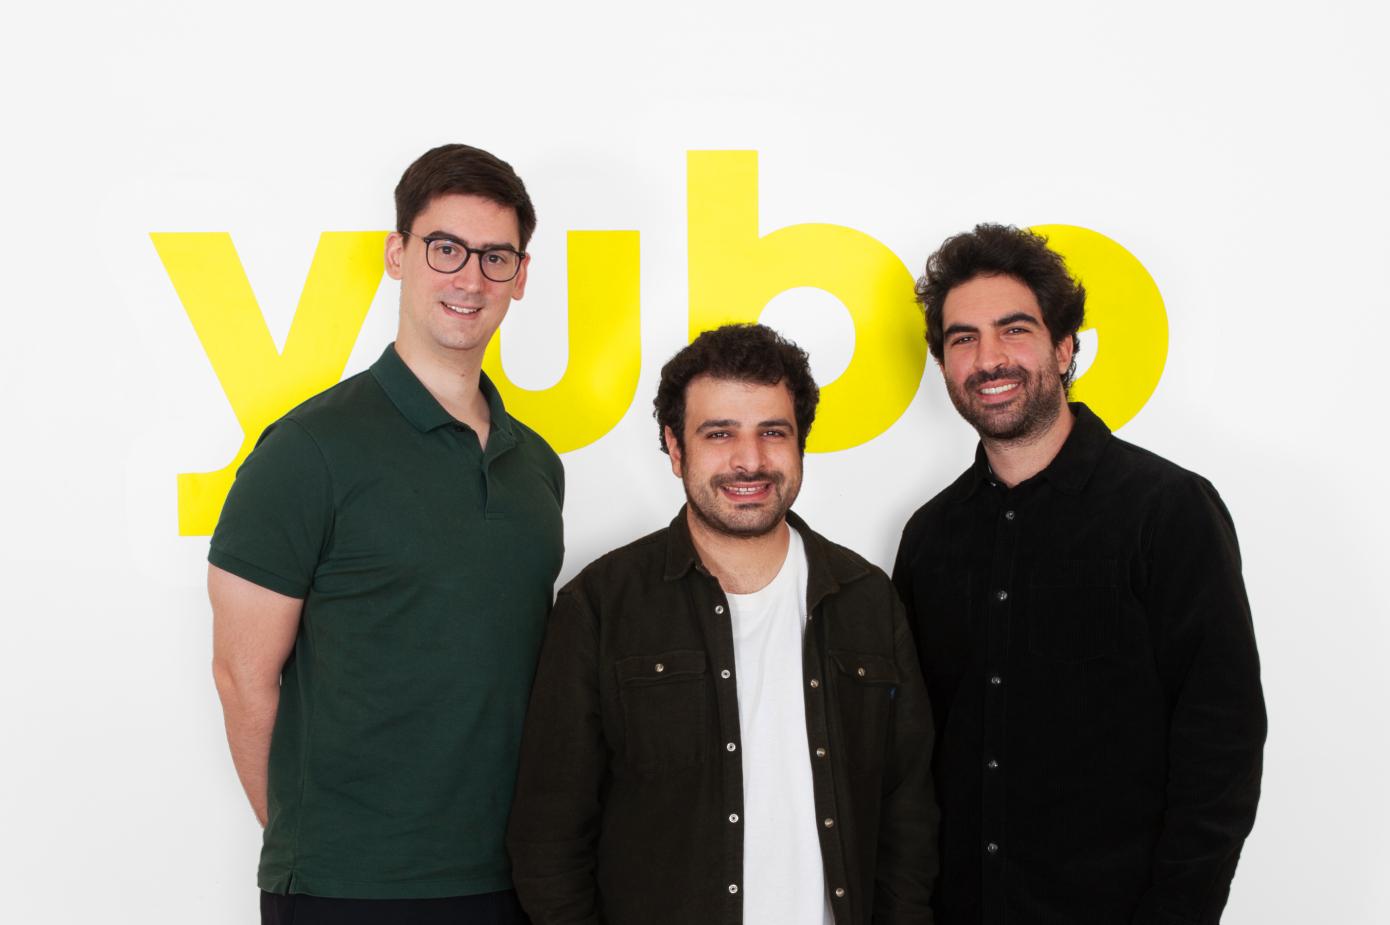 Gen Z social media platform Yubo raises $47.5m in Series C